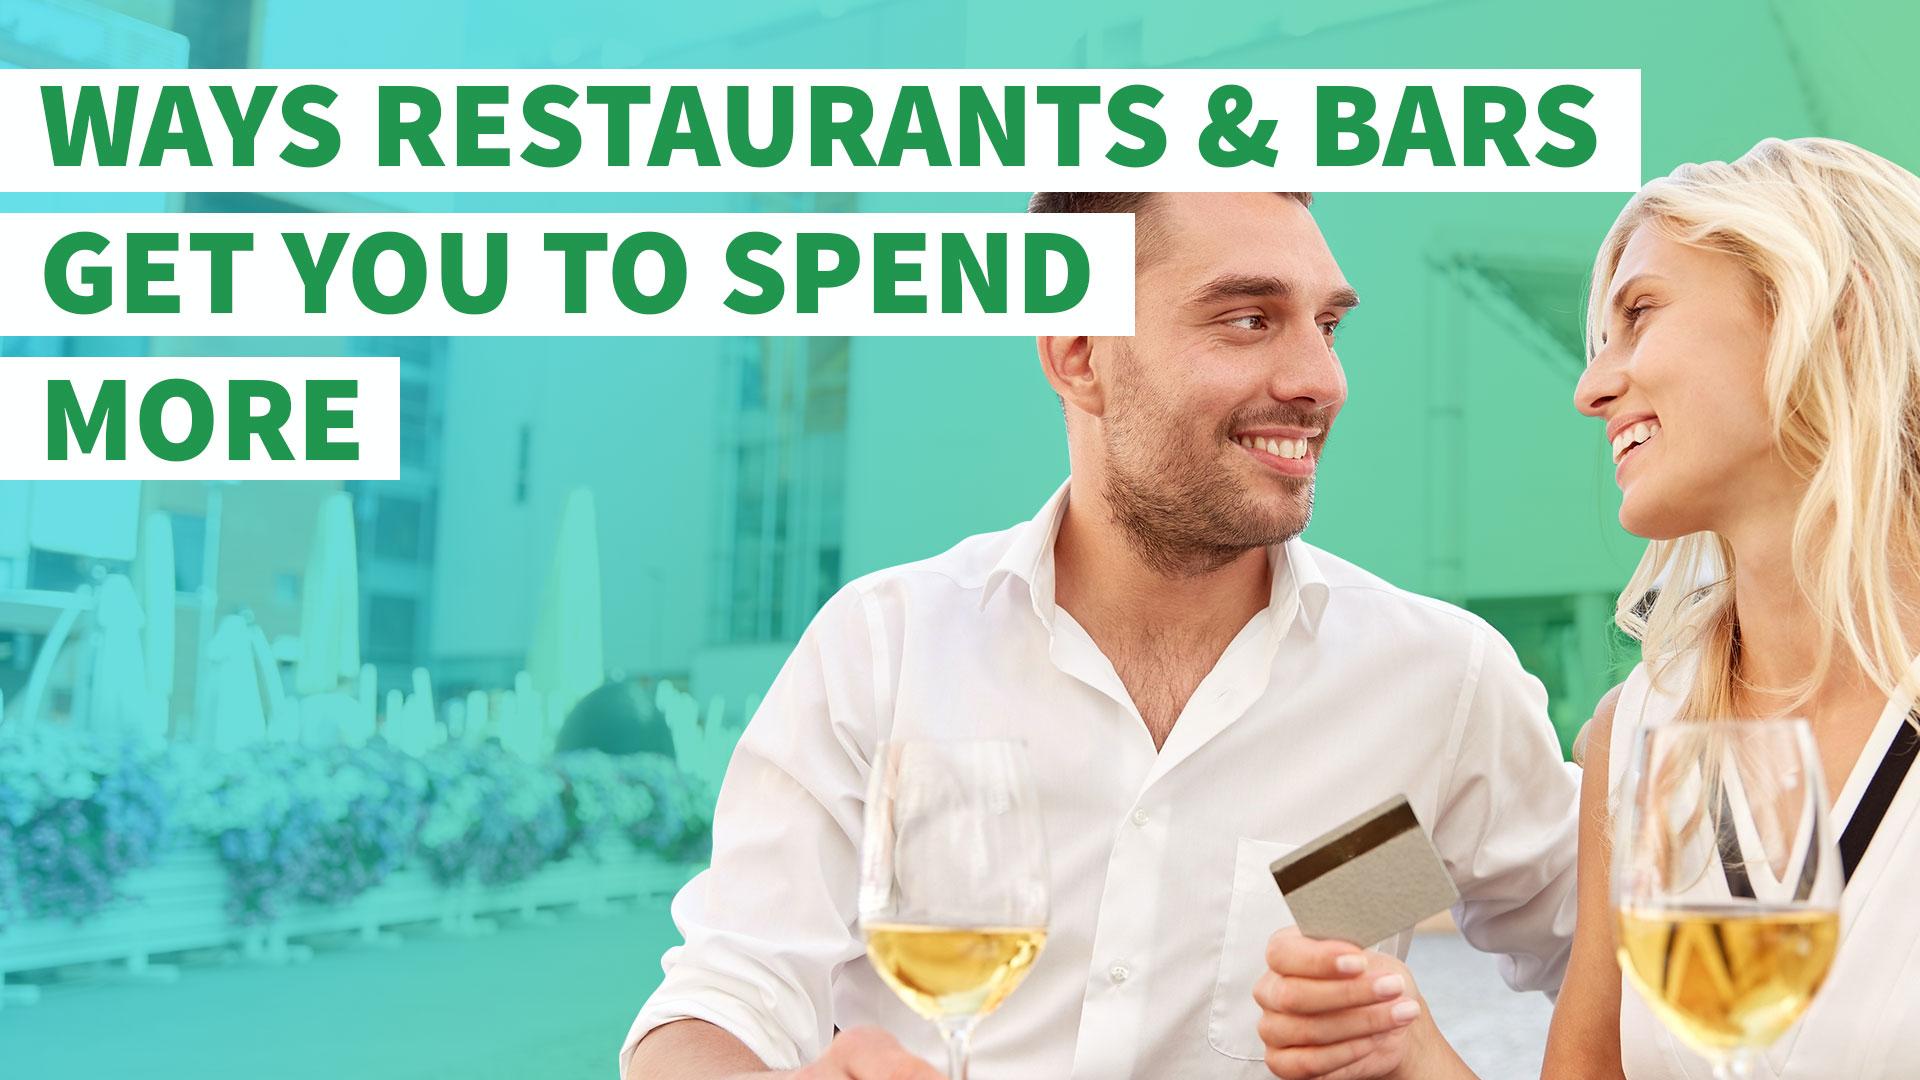 30 Sneaky Ways Restaurants Trick You Into Spending More Money